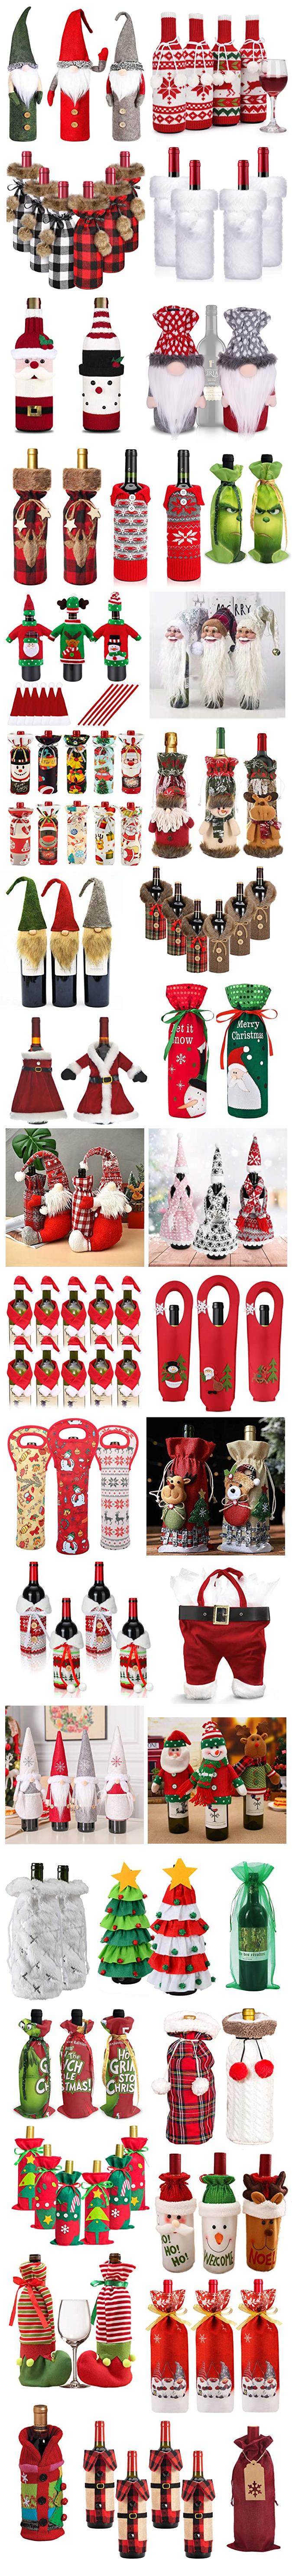 FUN CHRISTMAS WINE BOTTLE BAGS